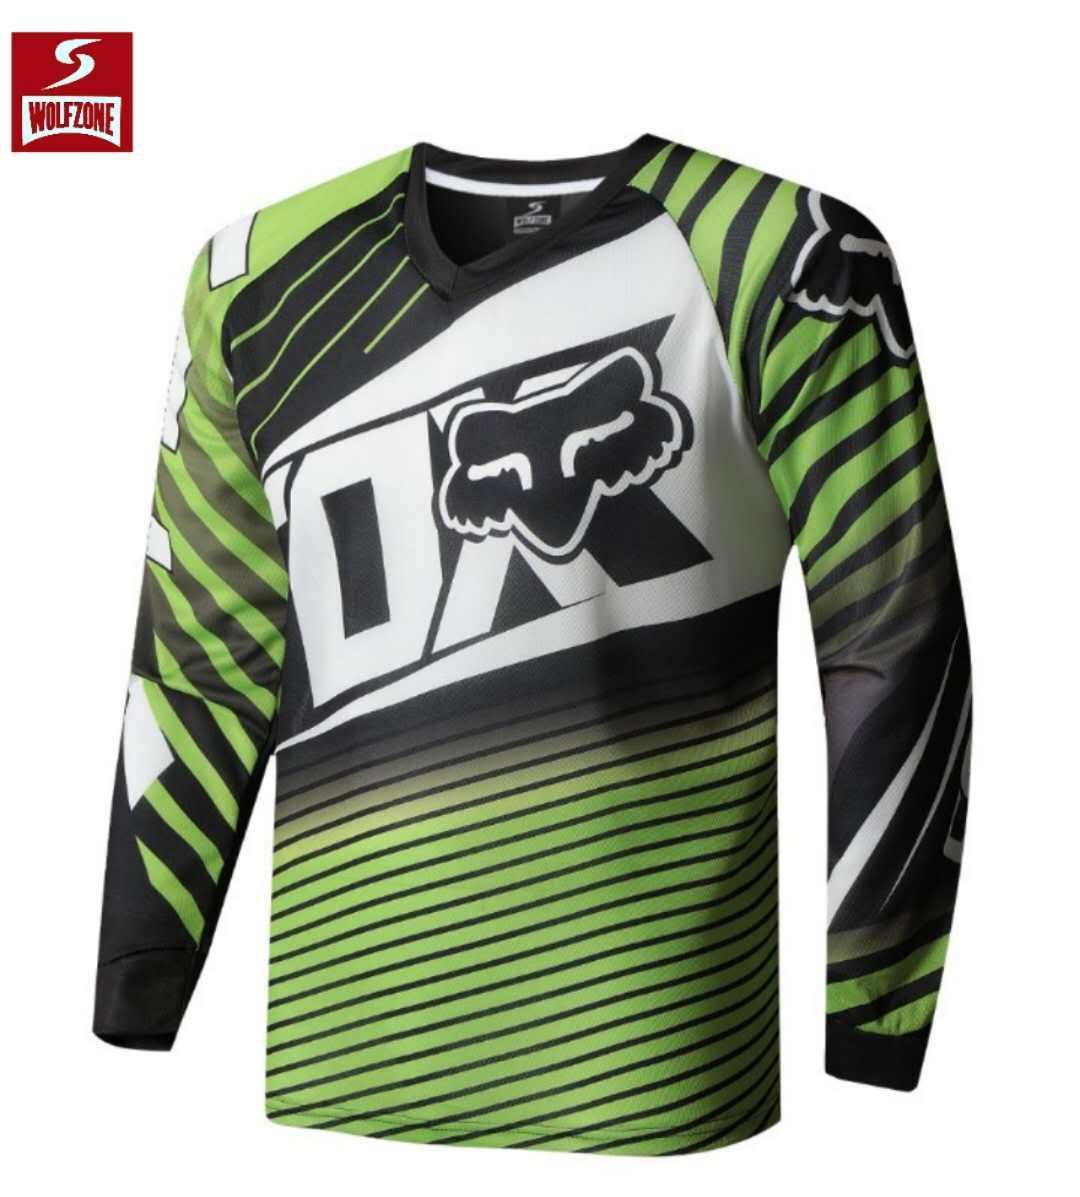 a2a2e0a57 Wolf Zone Spandex Fox Longsleeve Men s Sportswear Quick DryFortress Cycling  Mountain Bike Motocross Motorcycle MTB